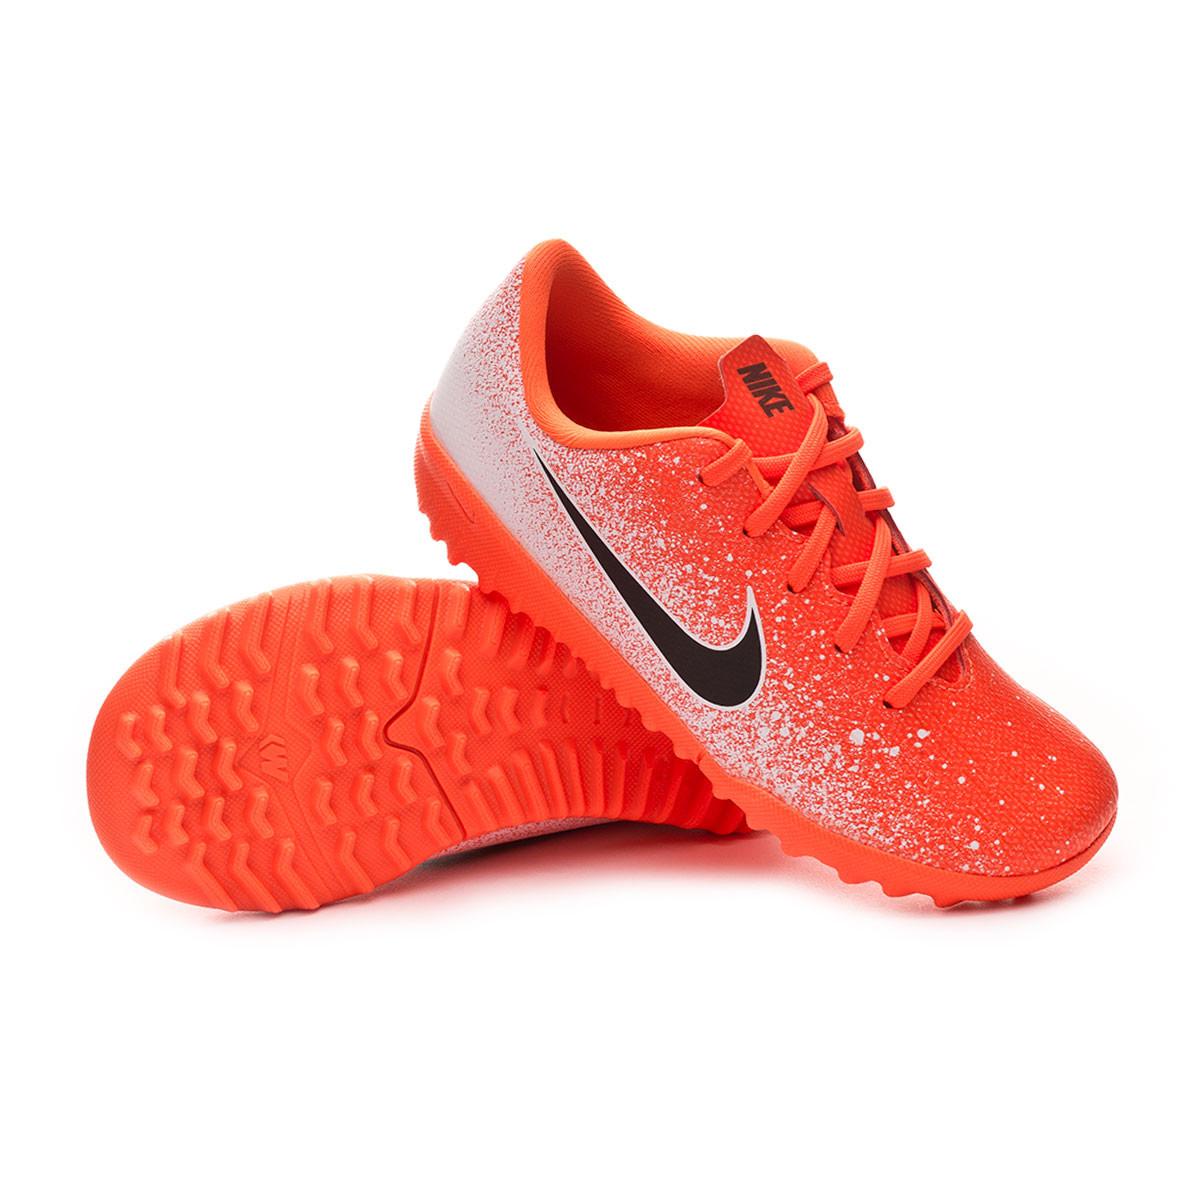 Chaussure de football Nike Mercurial VaporX XII Academy Turf enfant